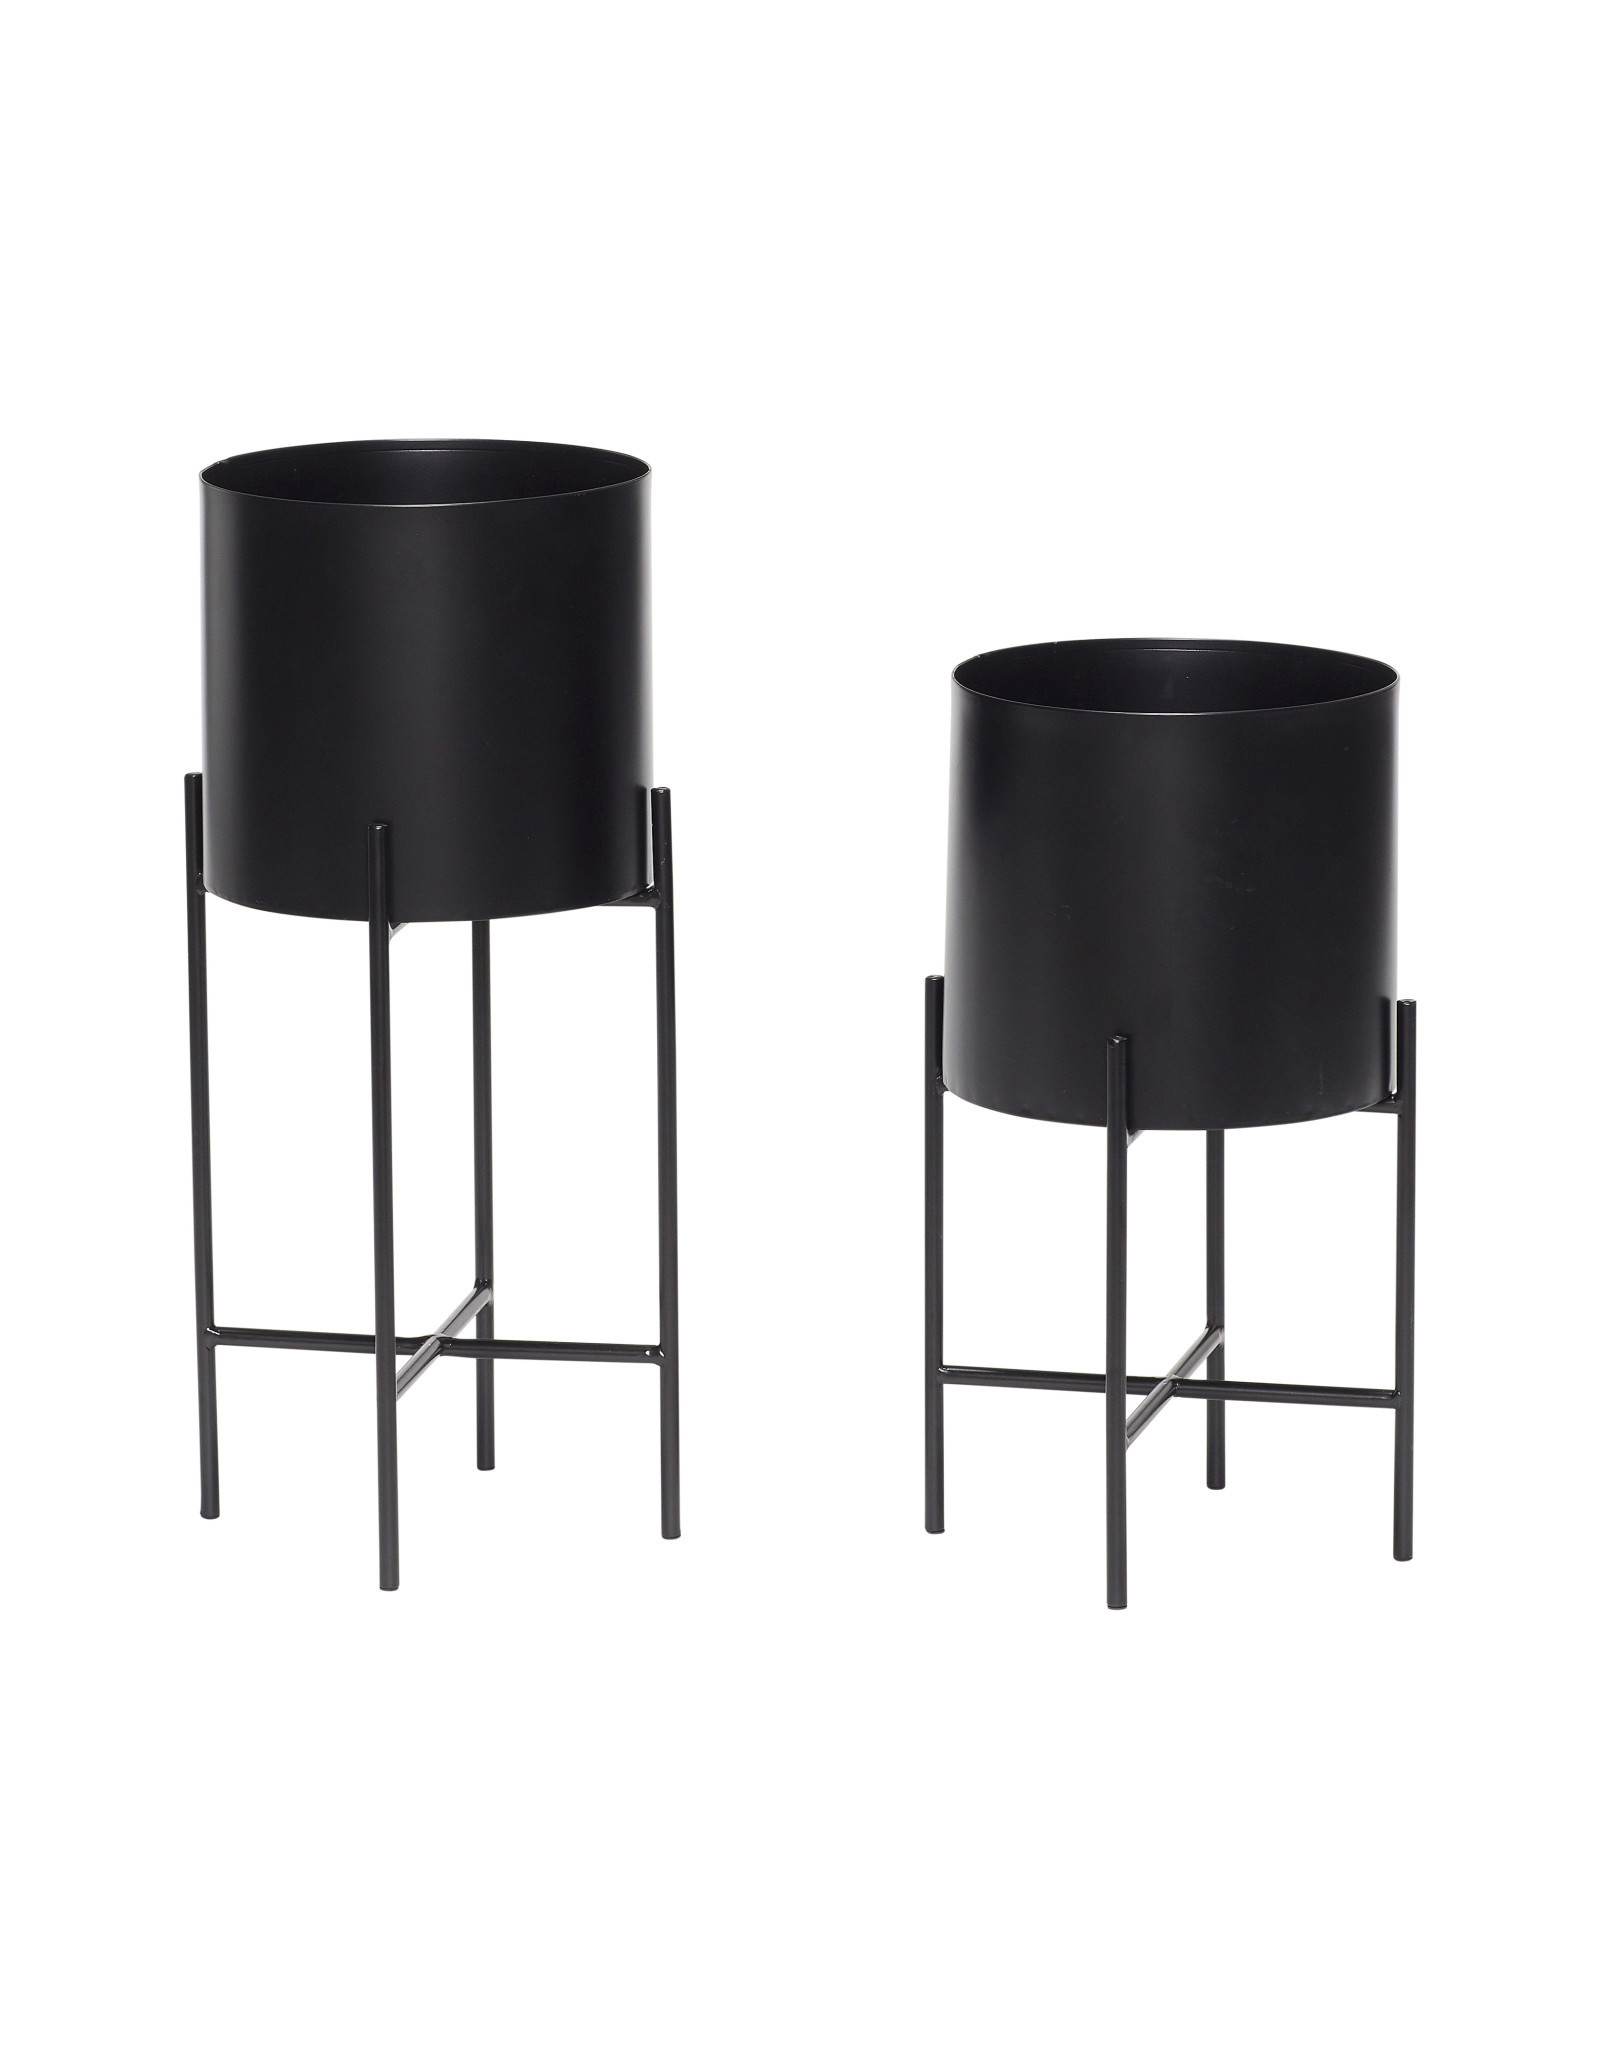 Hübsch Black Pot w/ legs ø25xh45